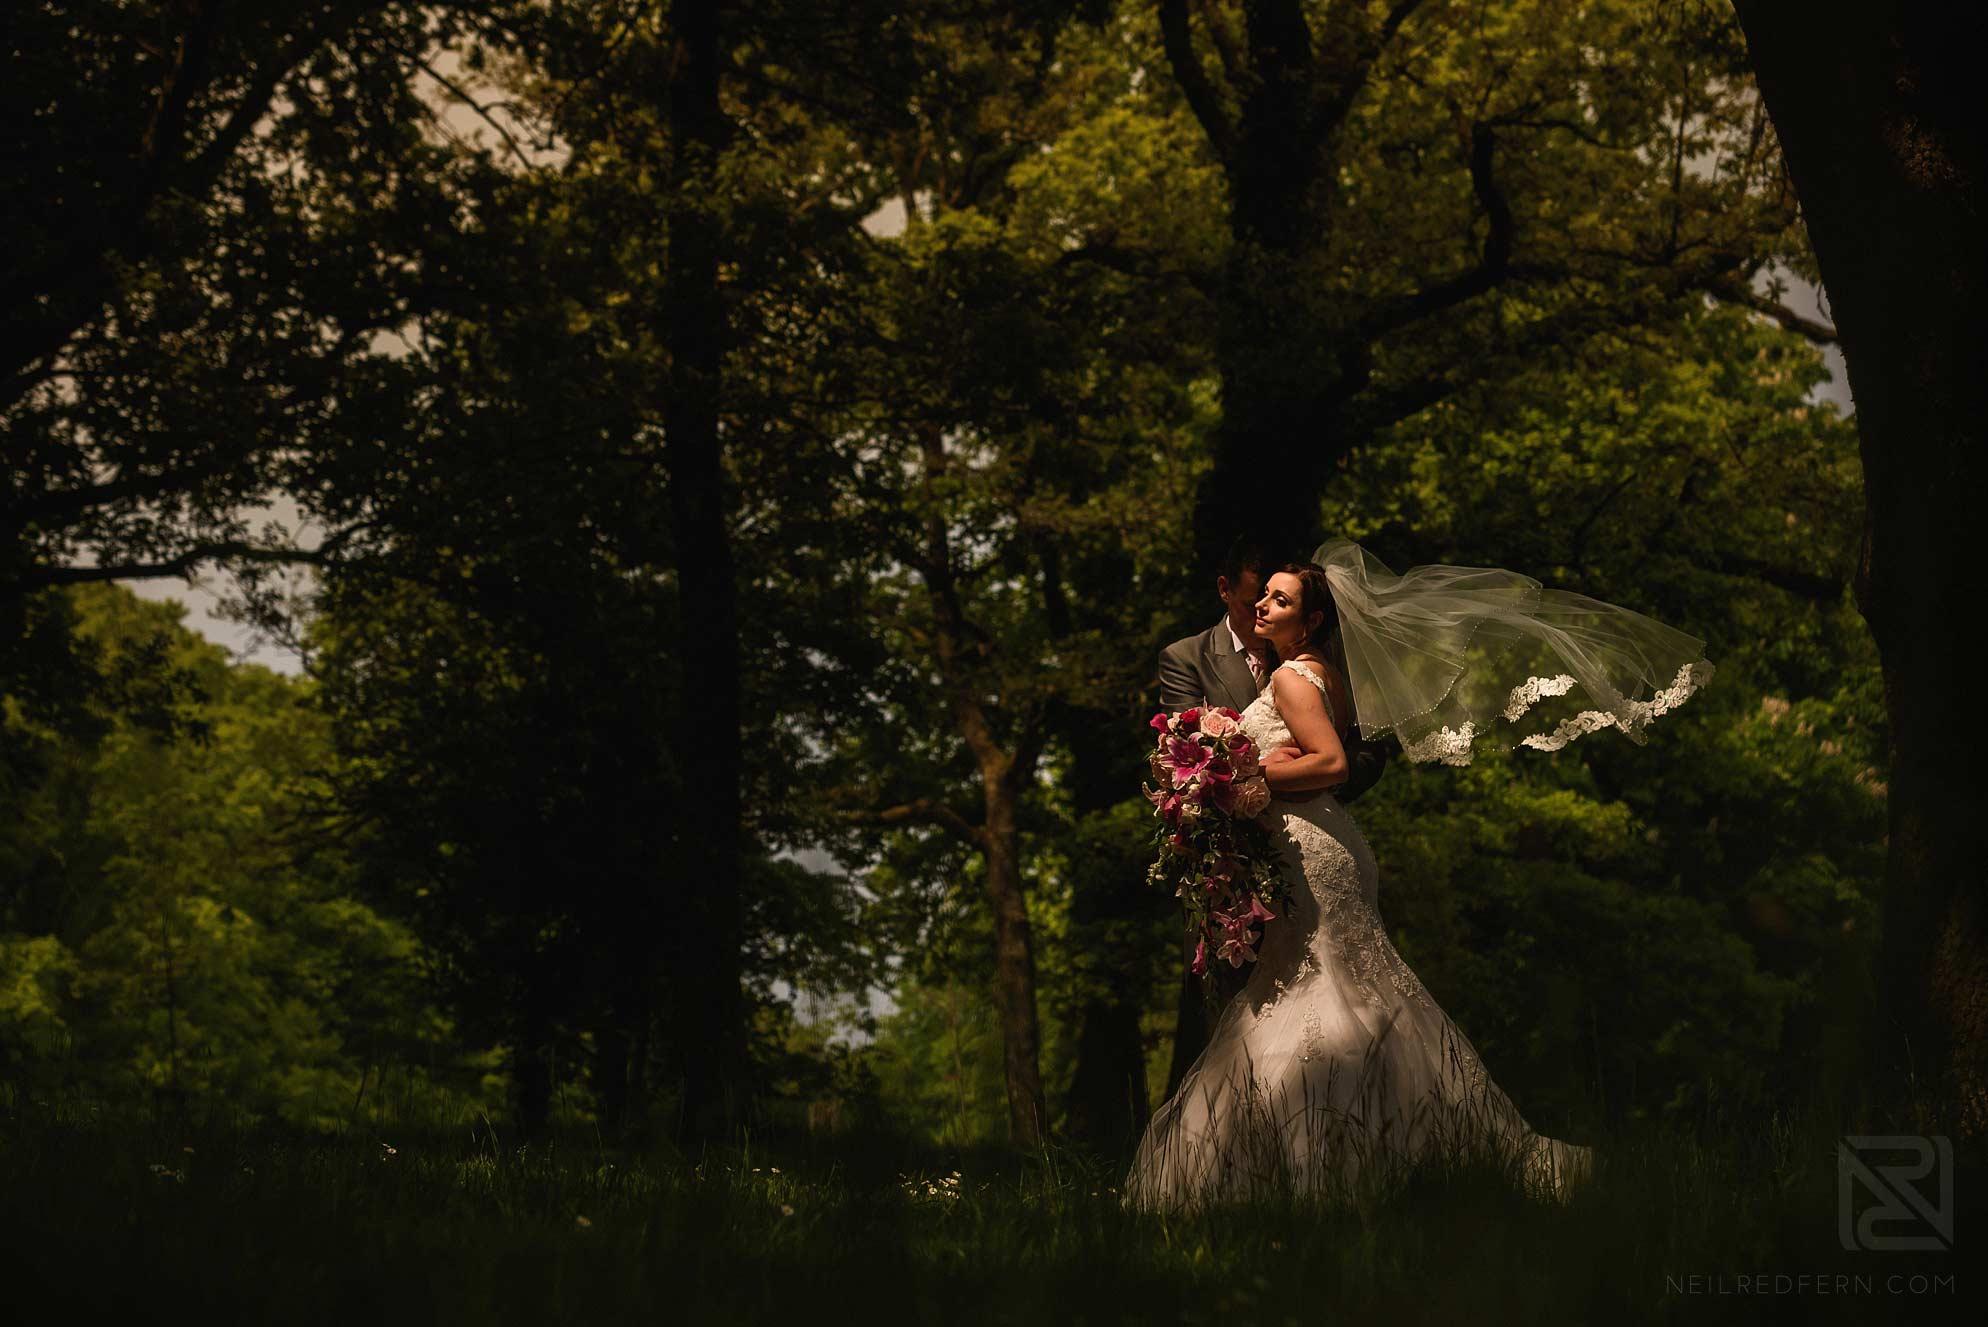 Metropole-Hotel-Llandrindod-Wells-wedding-01